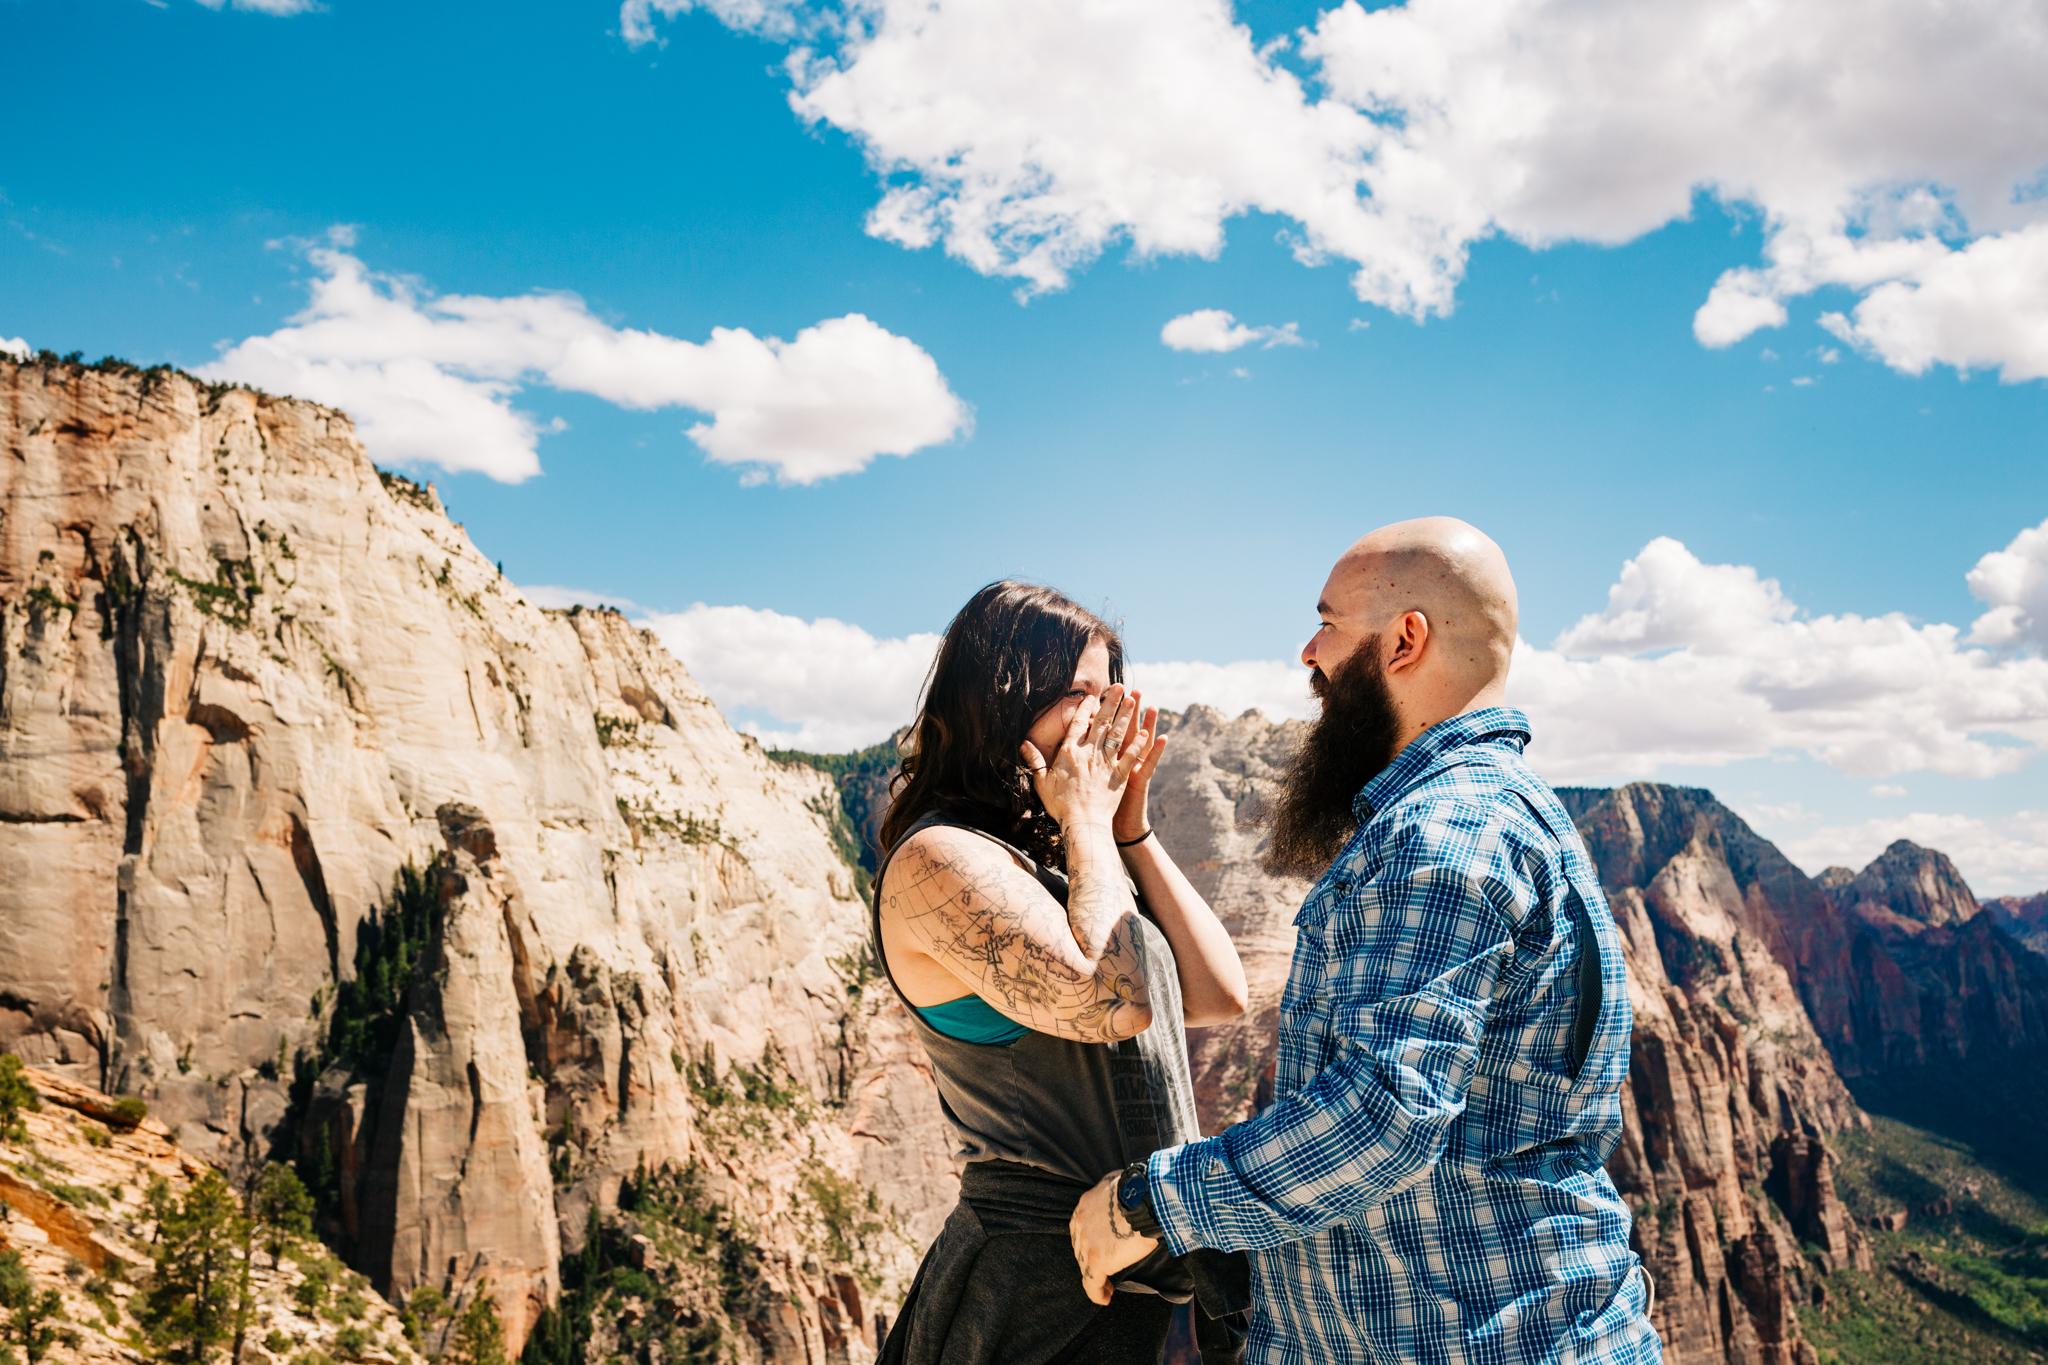 andrea-van-orsouw-photography-angels-landing-zion-national-park-proposal-utah-wedding-photographer.jpg